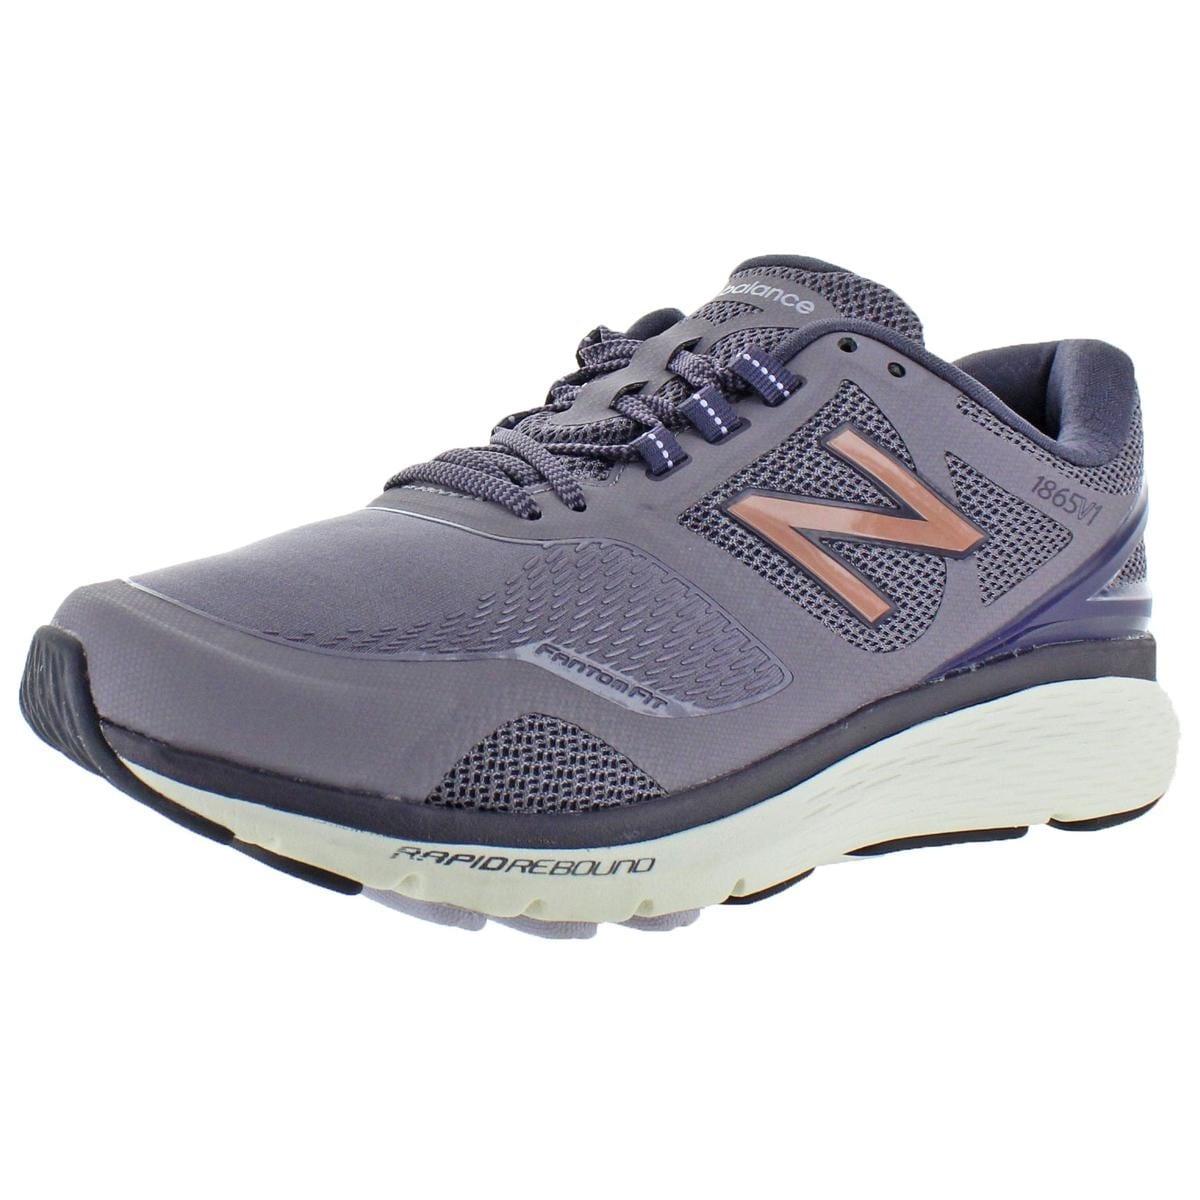 new balance lightweight walking shoes